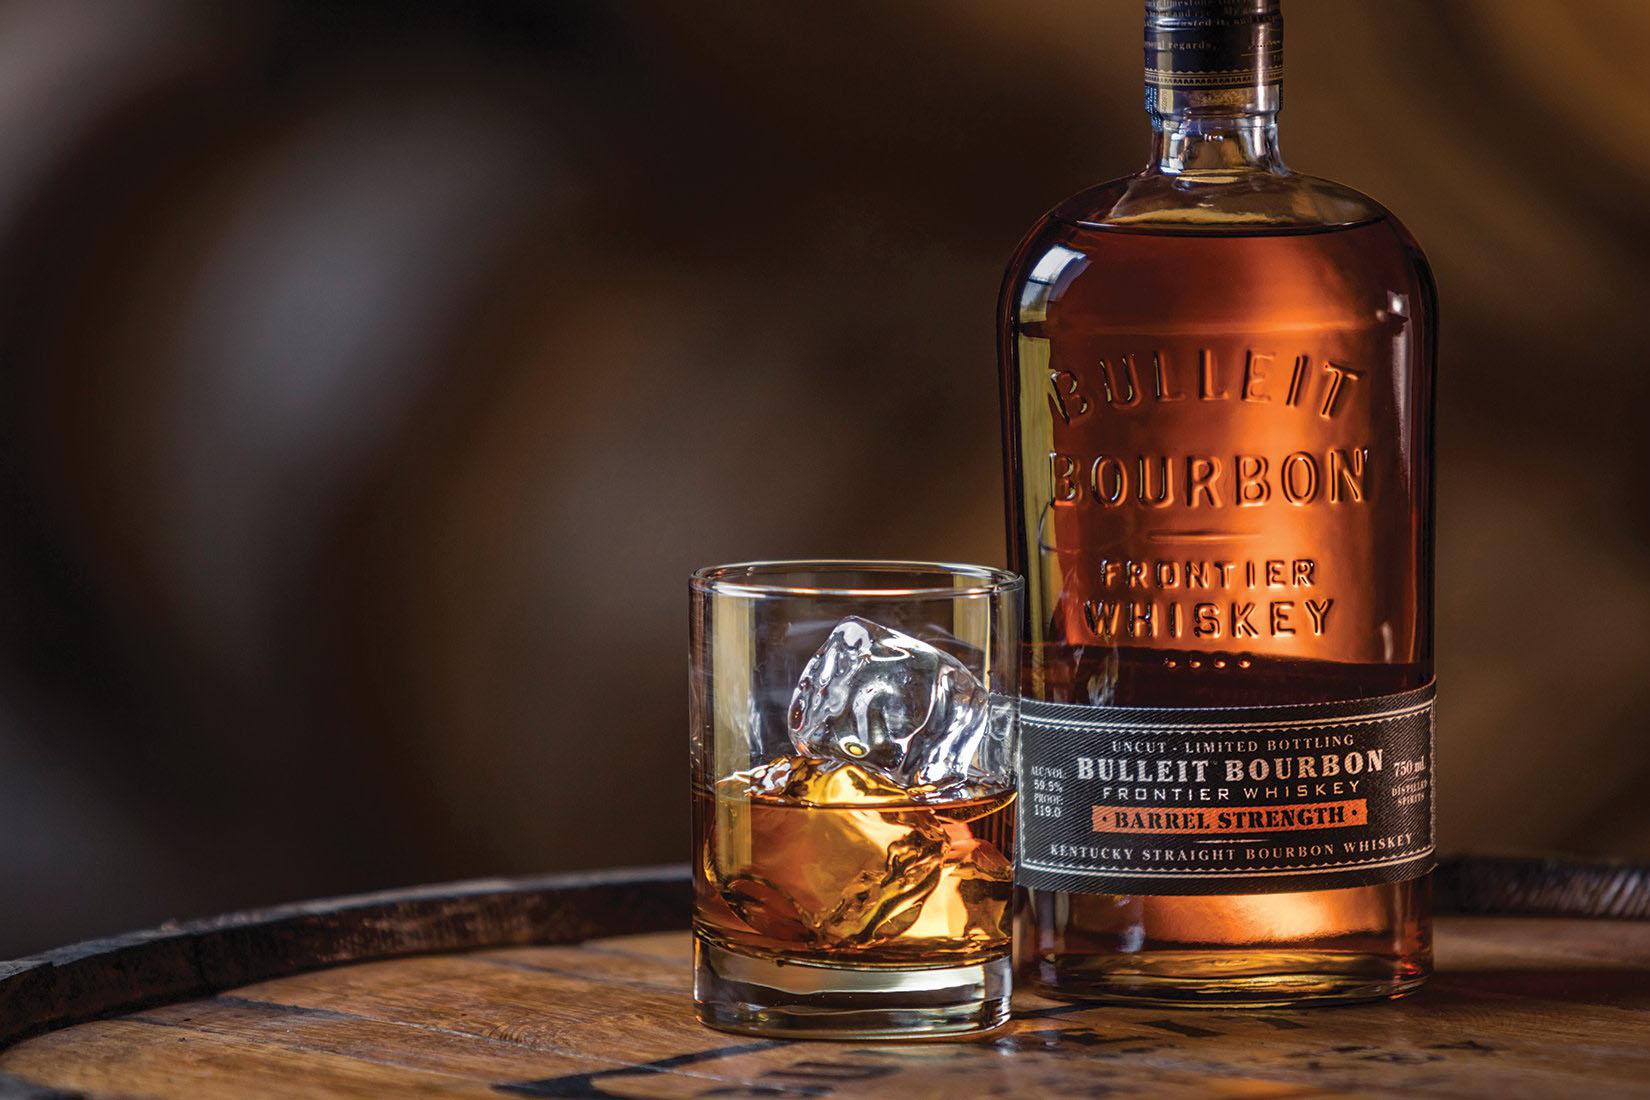 bulleit bourbon bottle price size Luxe Digital